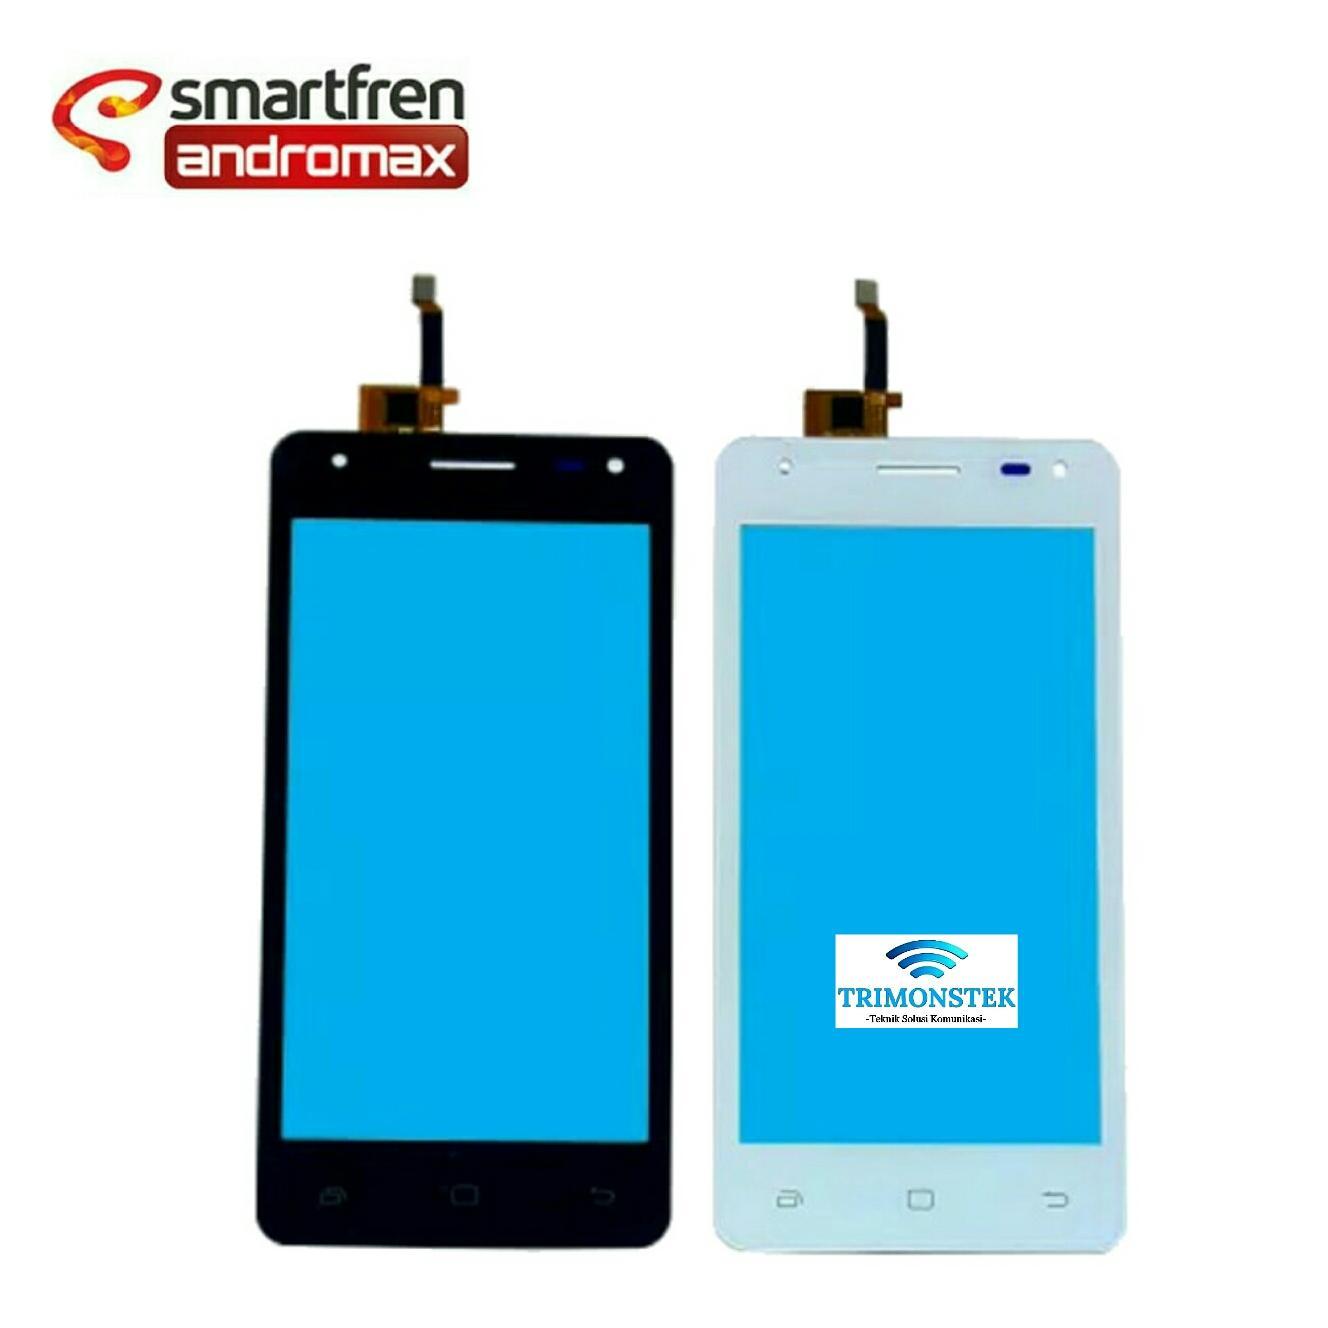 Touchscreen Layar Sentuh Smartfreen Andromax E2+ Plus B16C2G Original